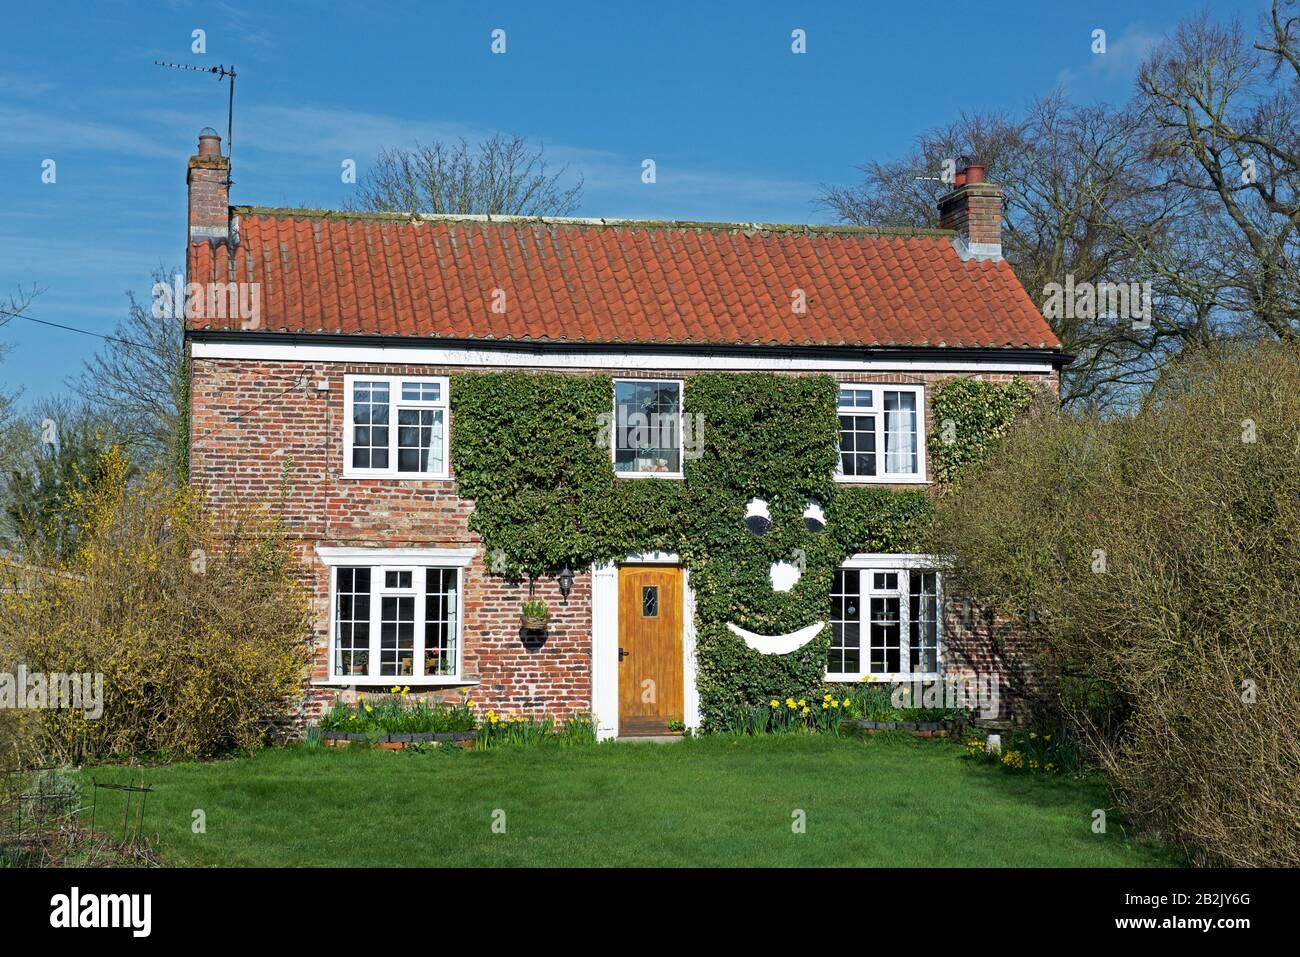 happy-house-in-the-village-of-hayton-east-yorkshire-england-uk-2B2JY6G.jpg